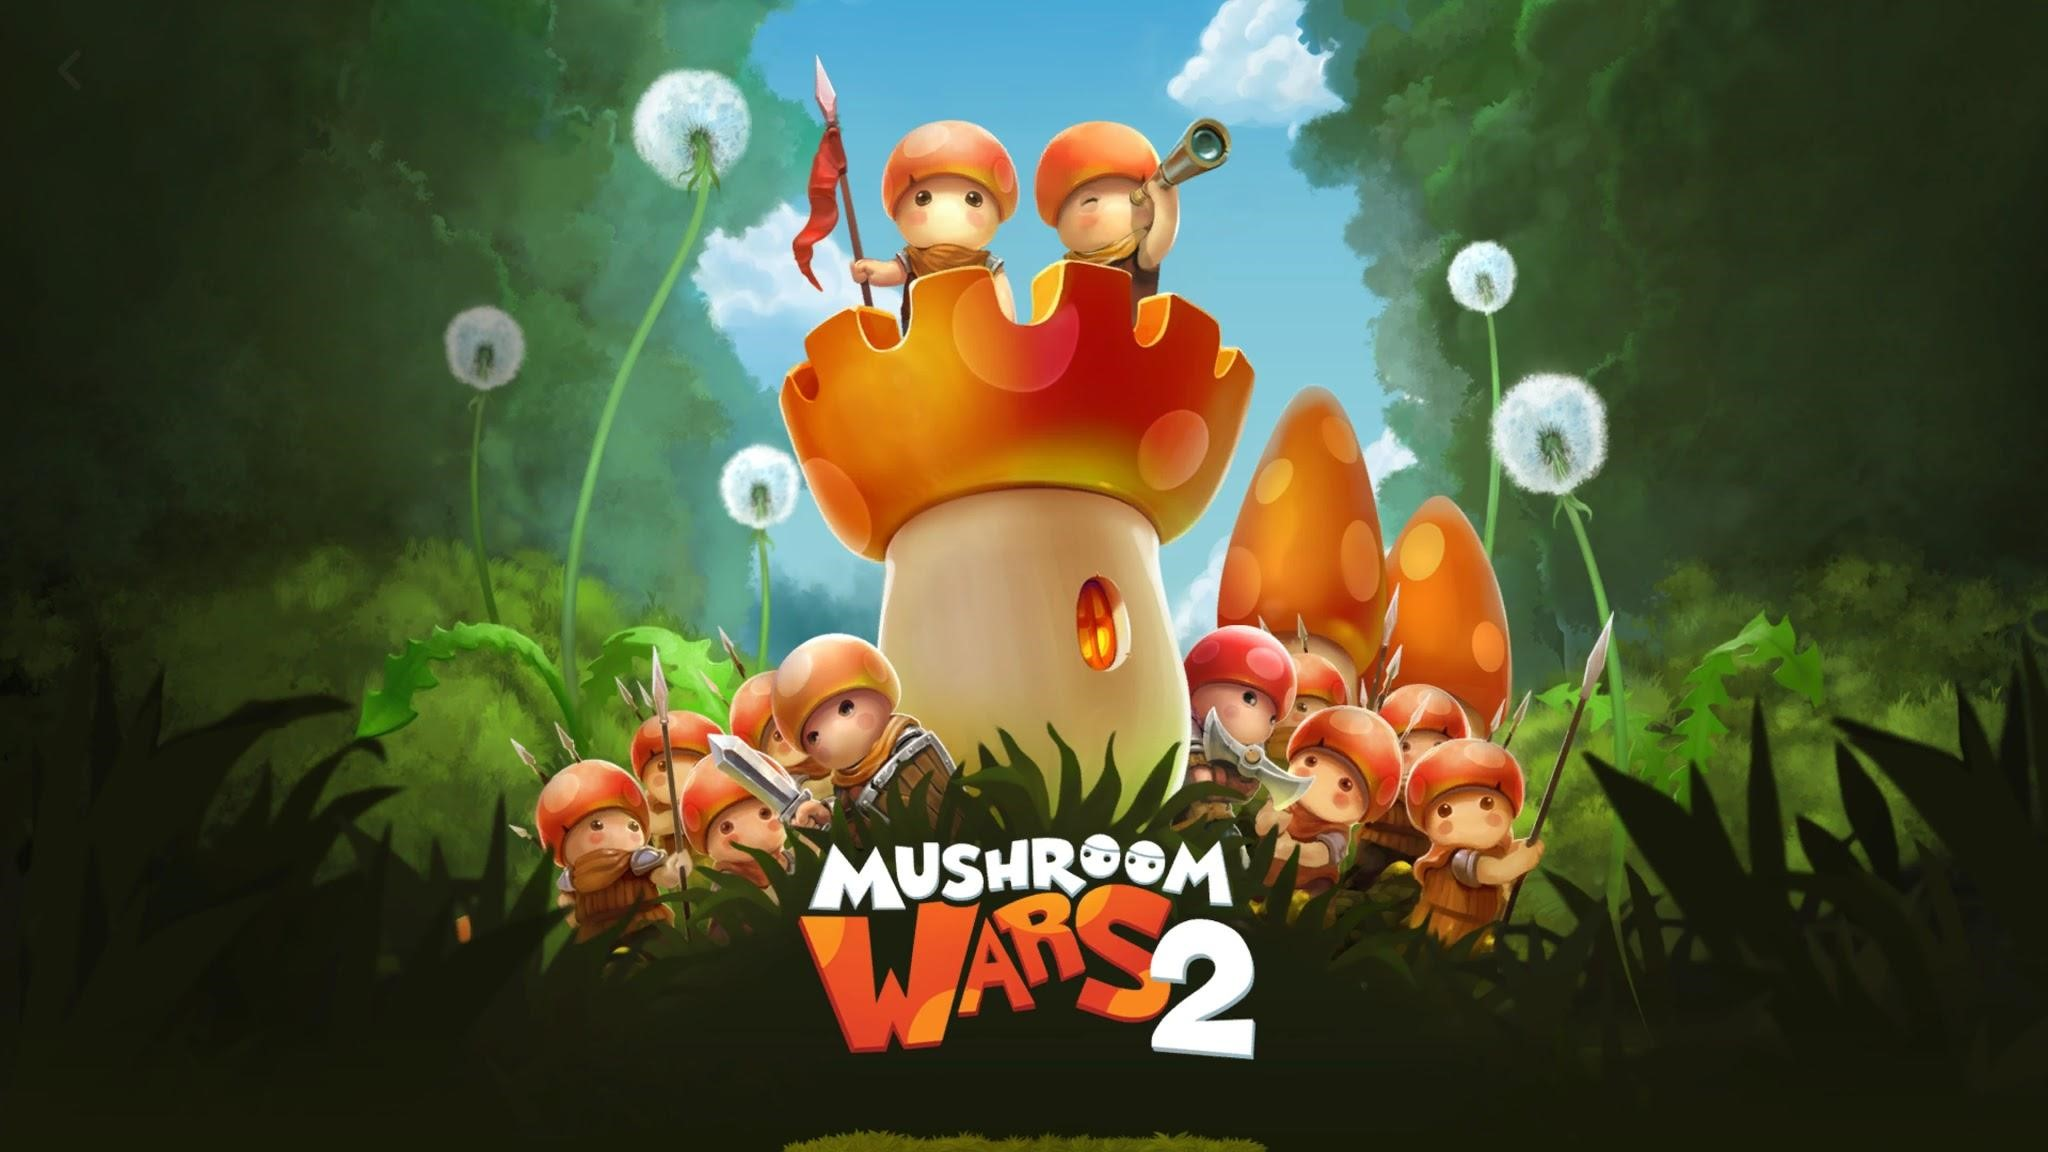 Mushroom Wars 2 review